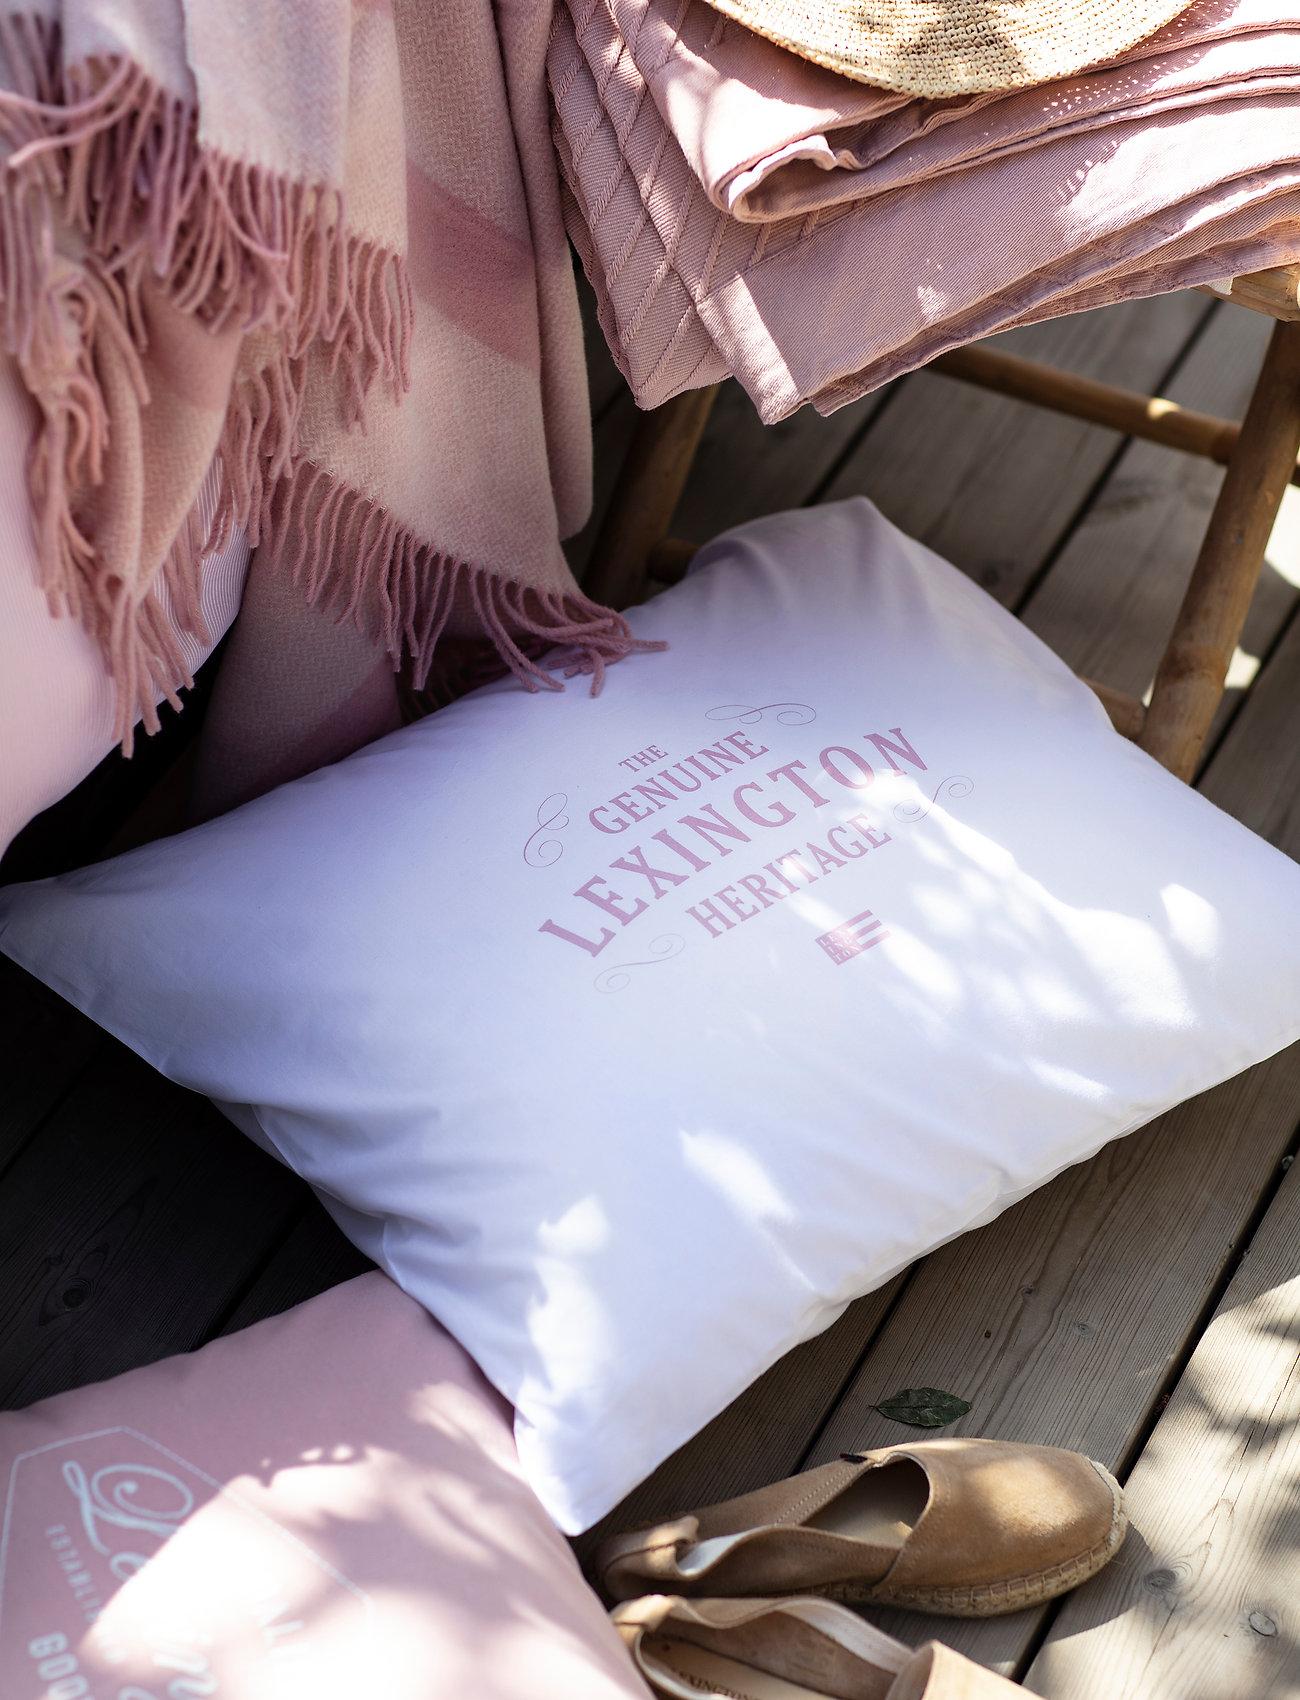 Lexington Home - Lexington Printed Cotton Poplin Pillowcase - pillowcases - white/pink - 1